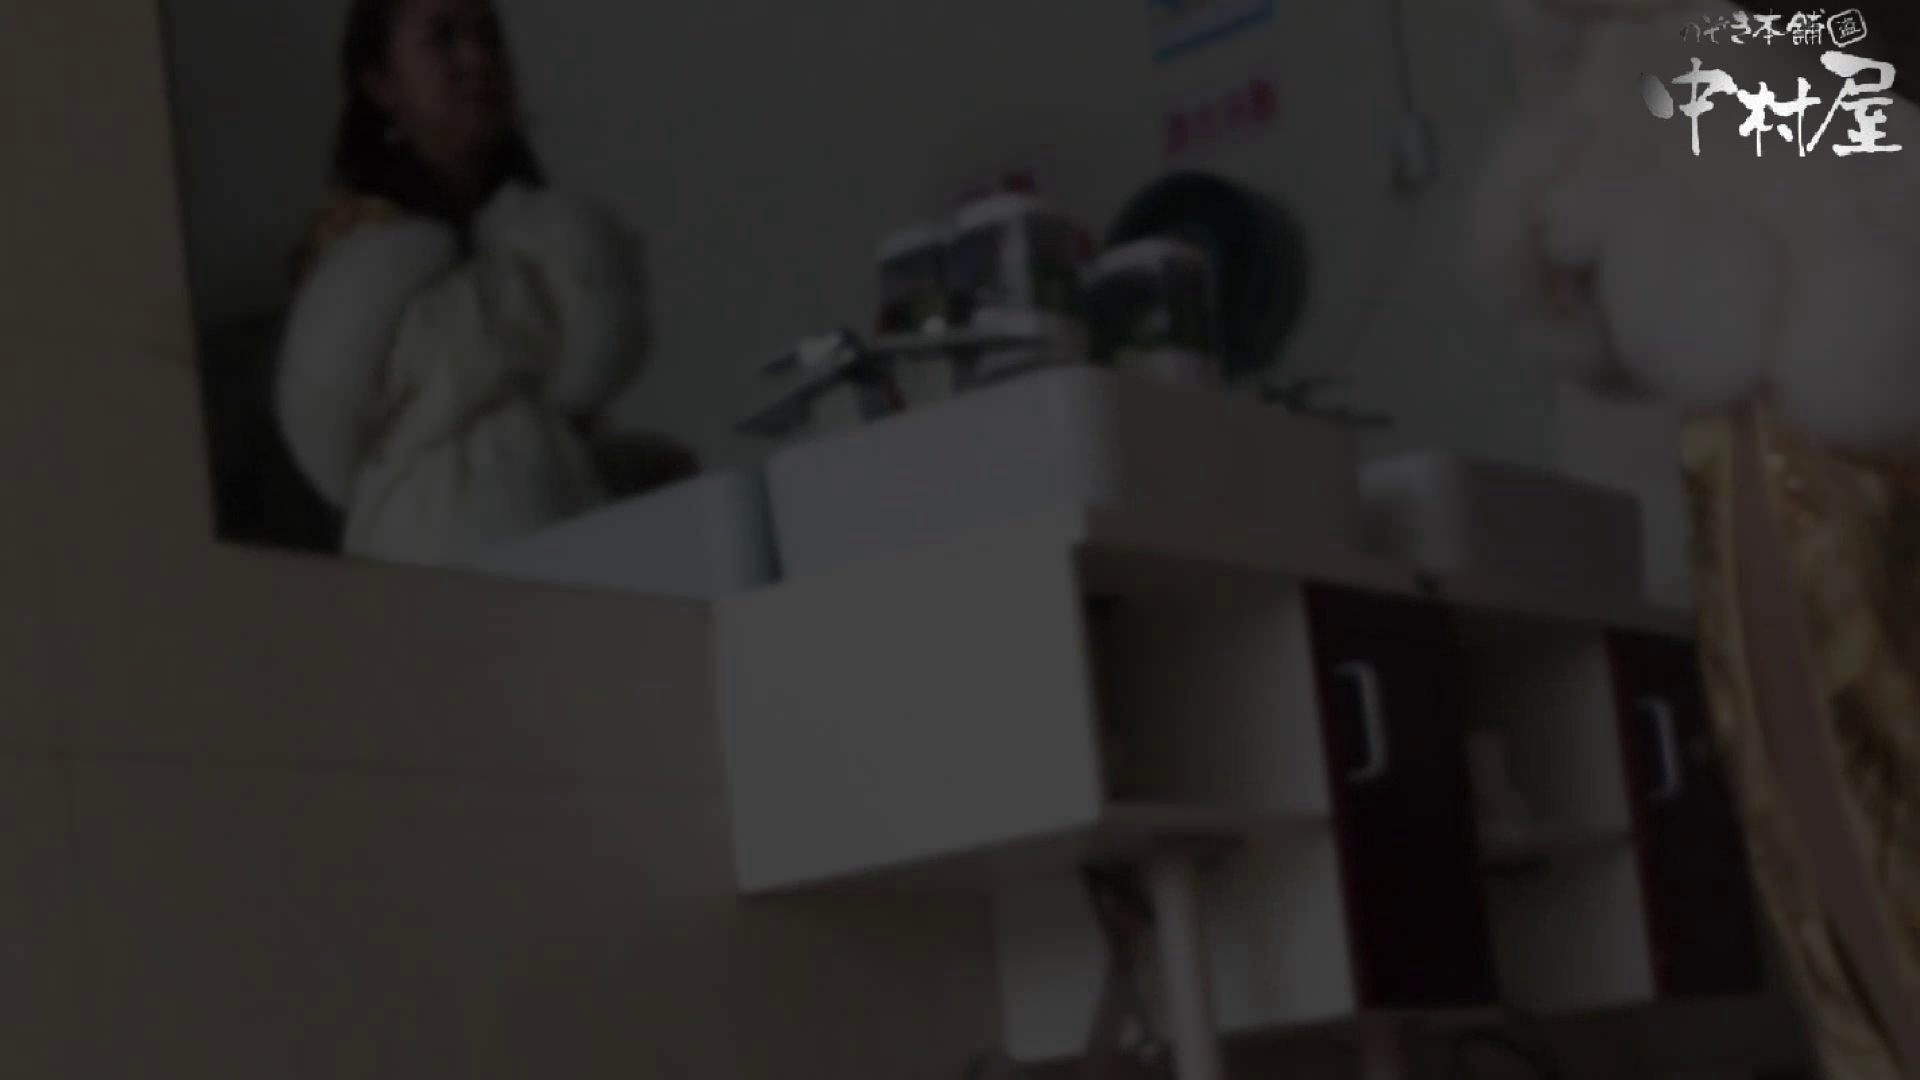 GOD HAND 芸術大学盗撮‼vol.111 OLのエロ生活 オマンコ無修正動画無料 92連発 42